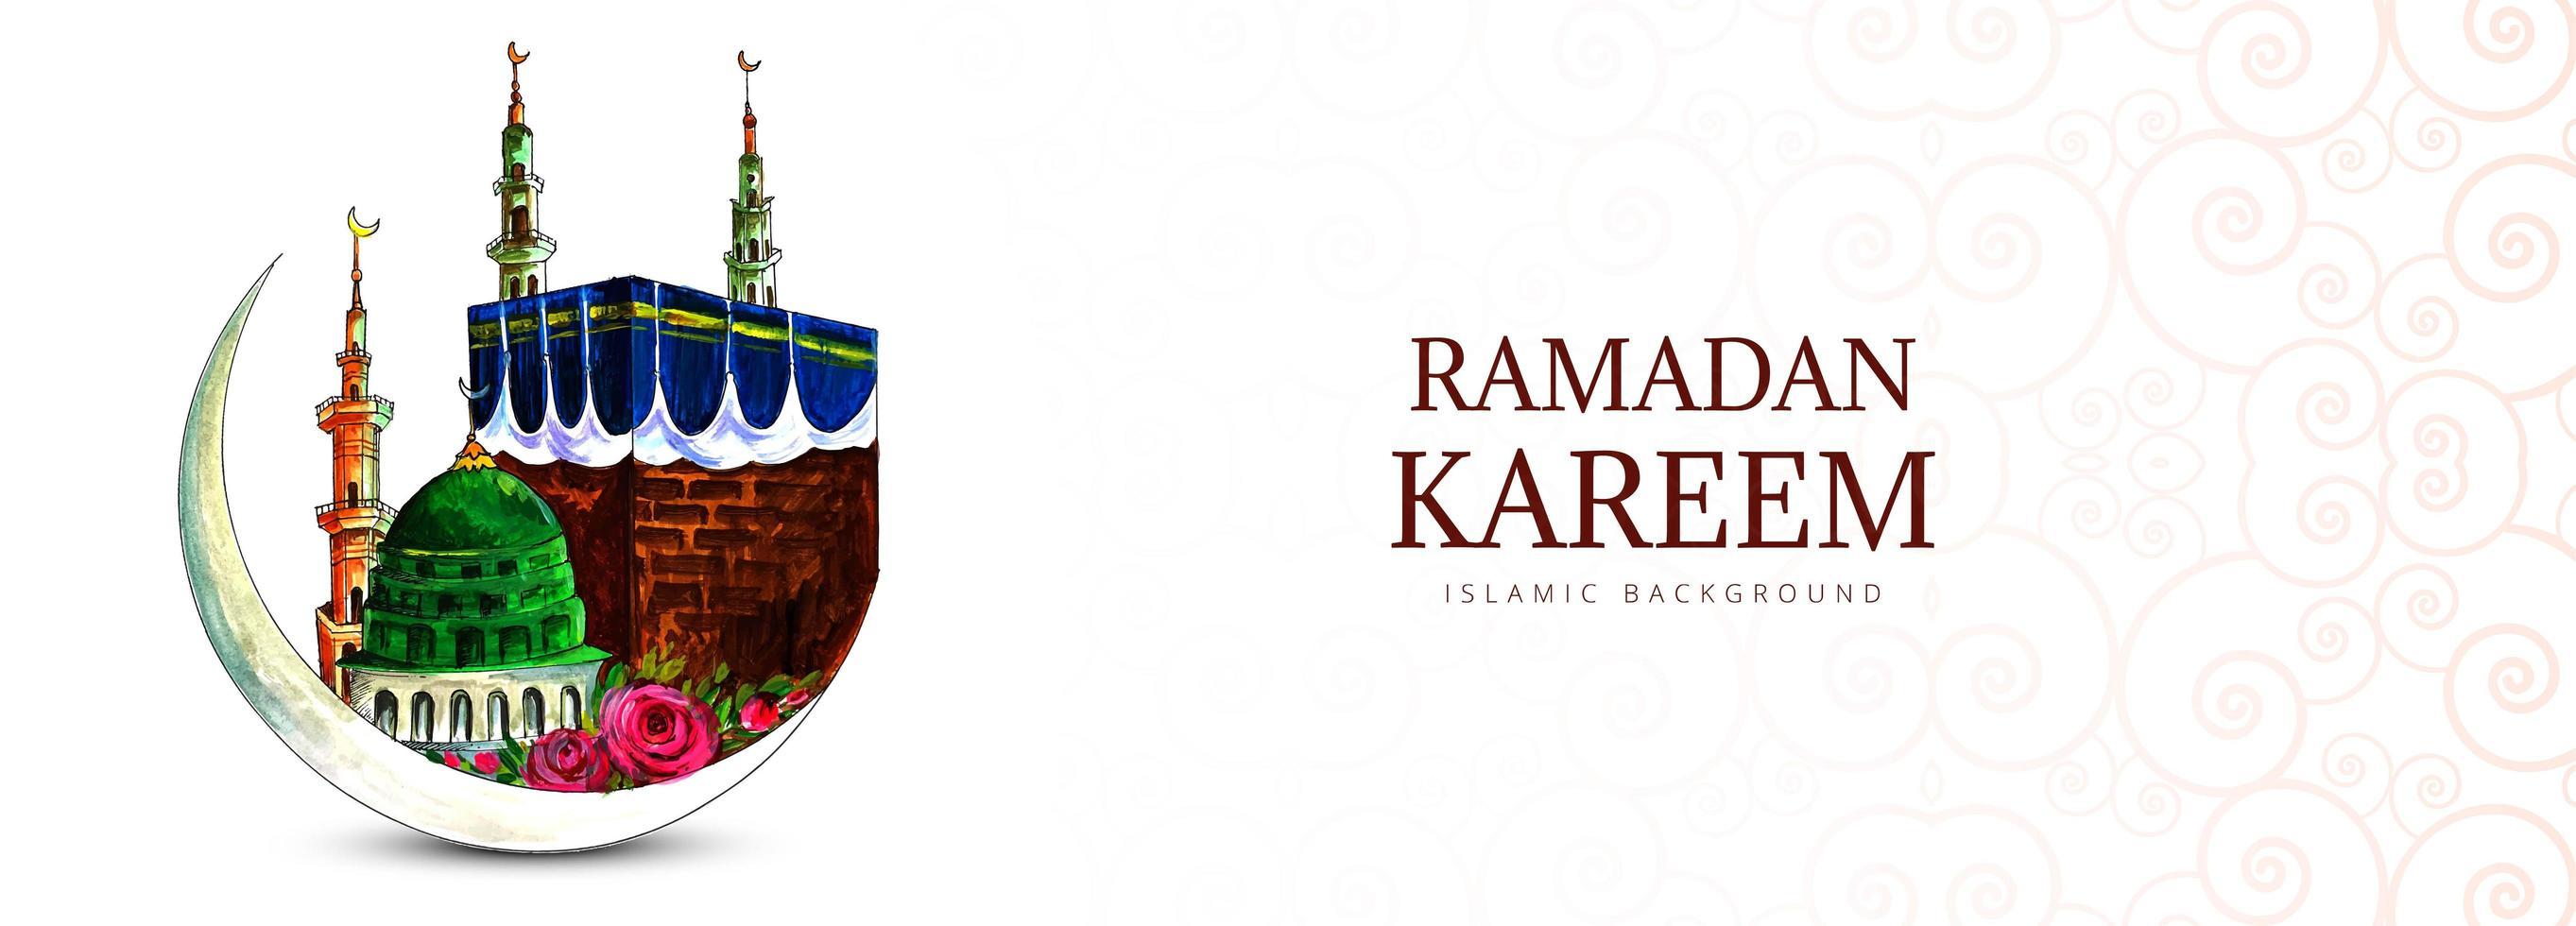 Hand Drawn Mosque Design Ramadan Kareem Banner  vector